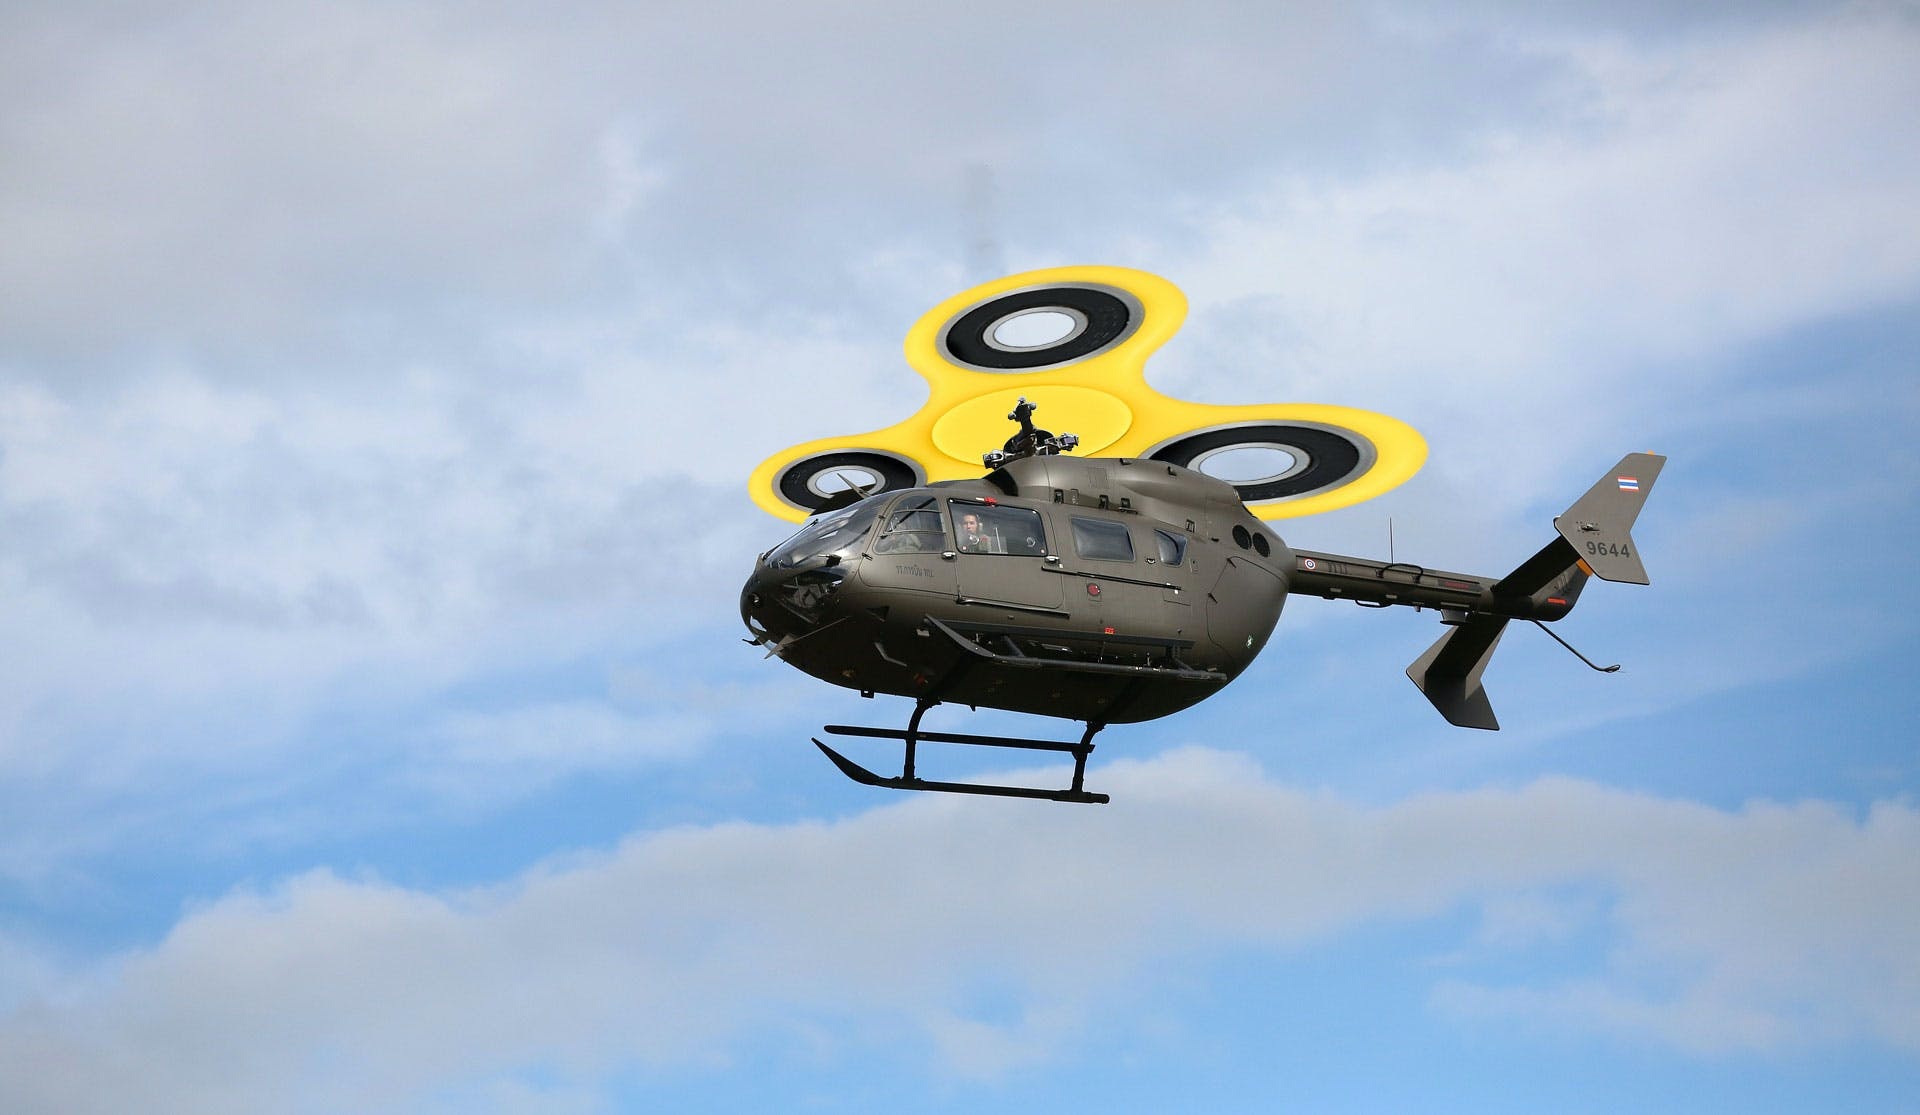 Helicopter plus fidget spinner